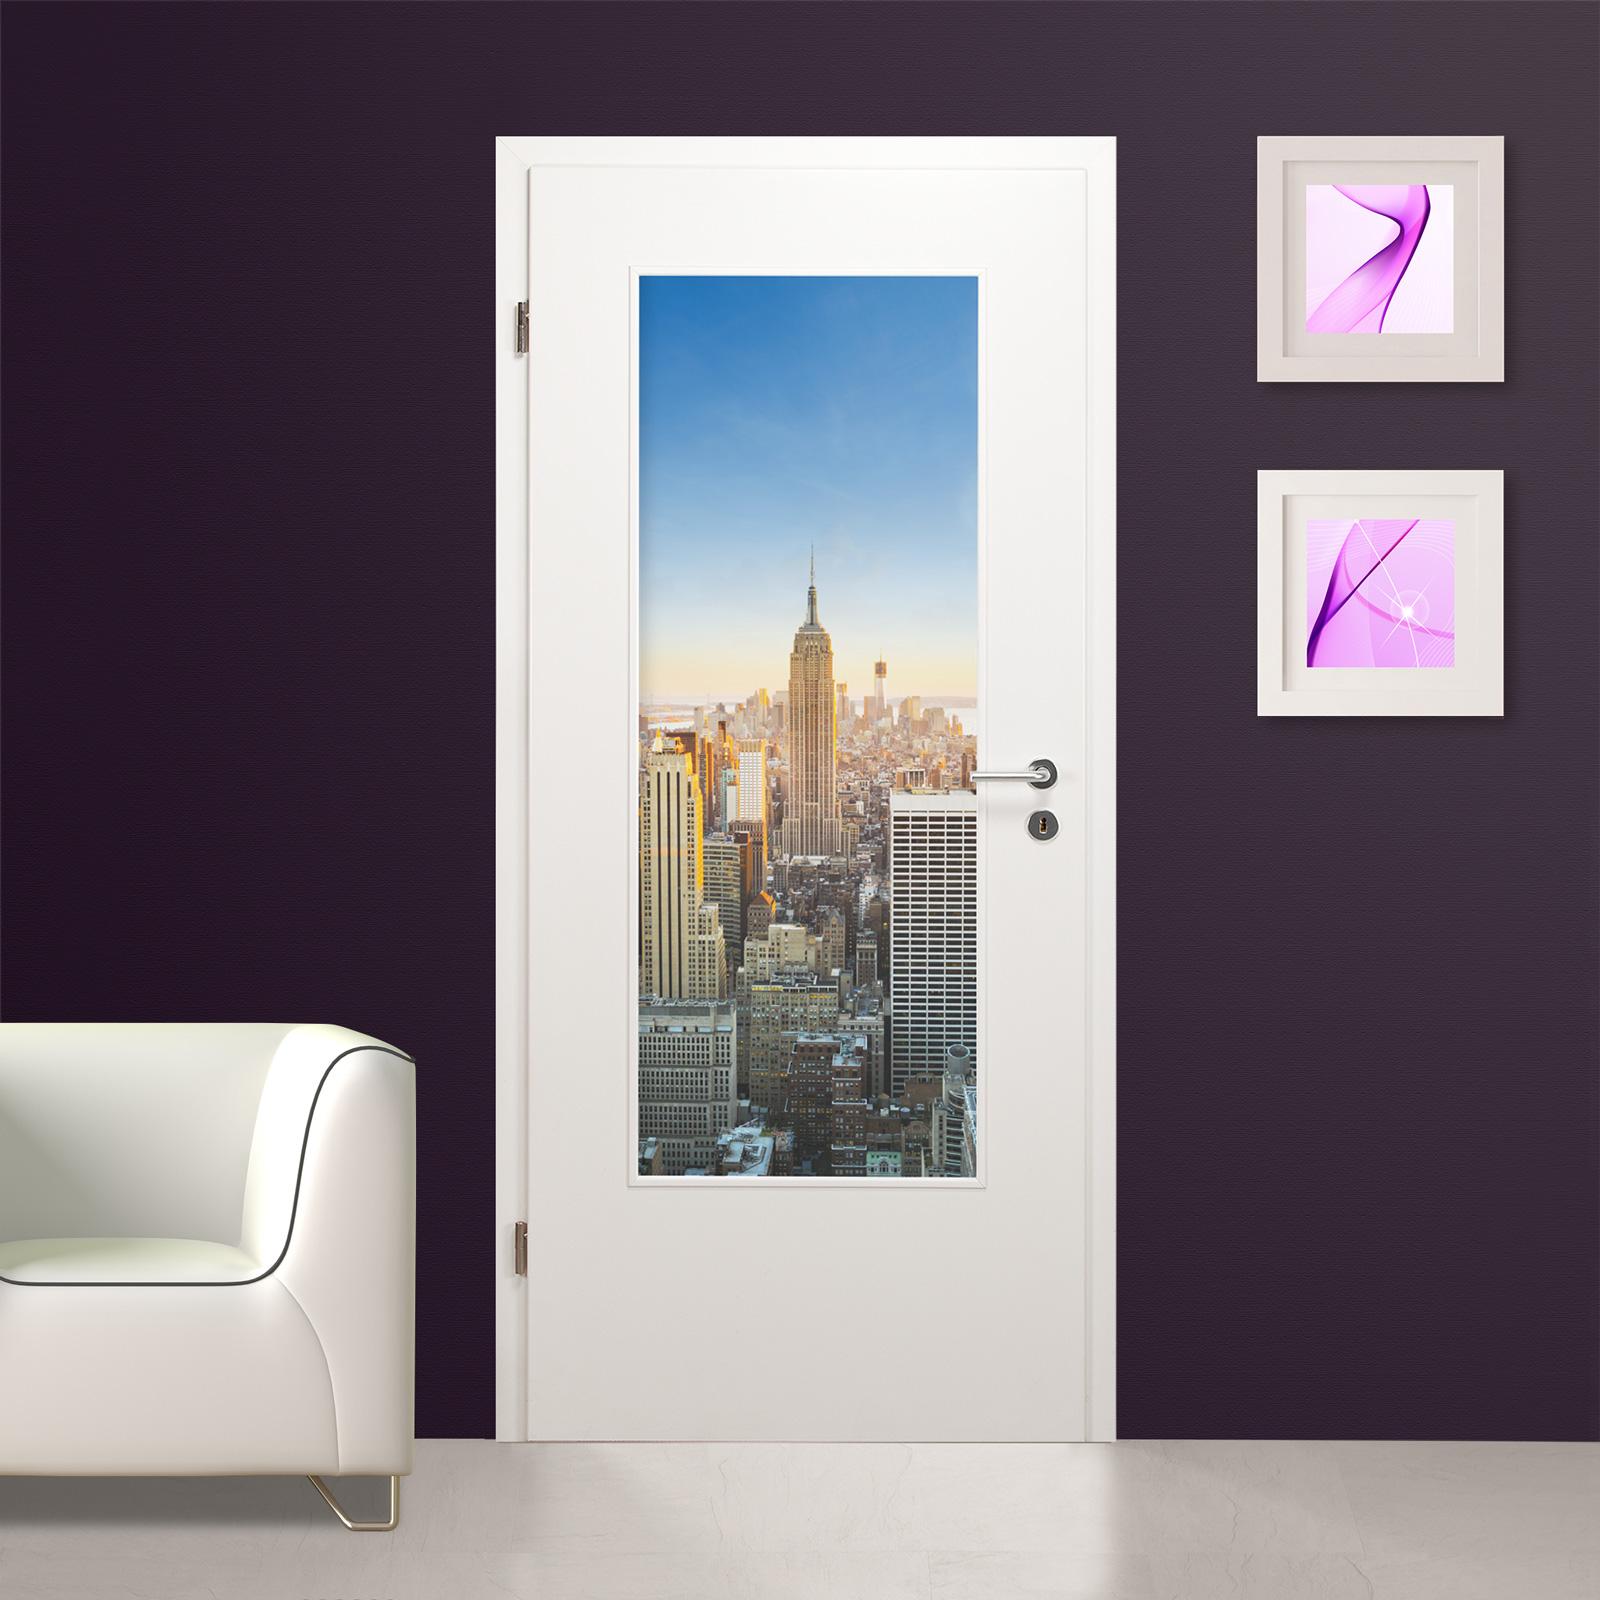 glaseinsatz f r holzt r digitaldruck hochwertig 1014 1 la motiv new york ebay. Black Bedroom Furniture Sets. Home Design Ideas